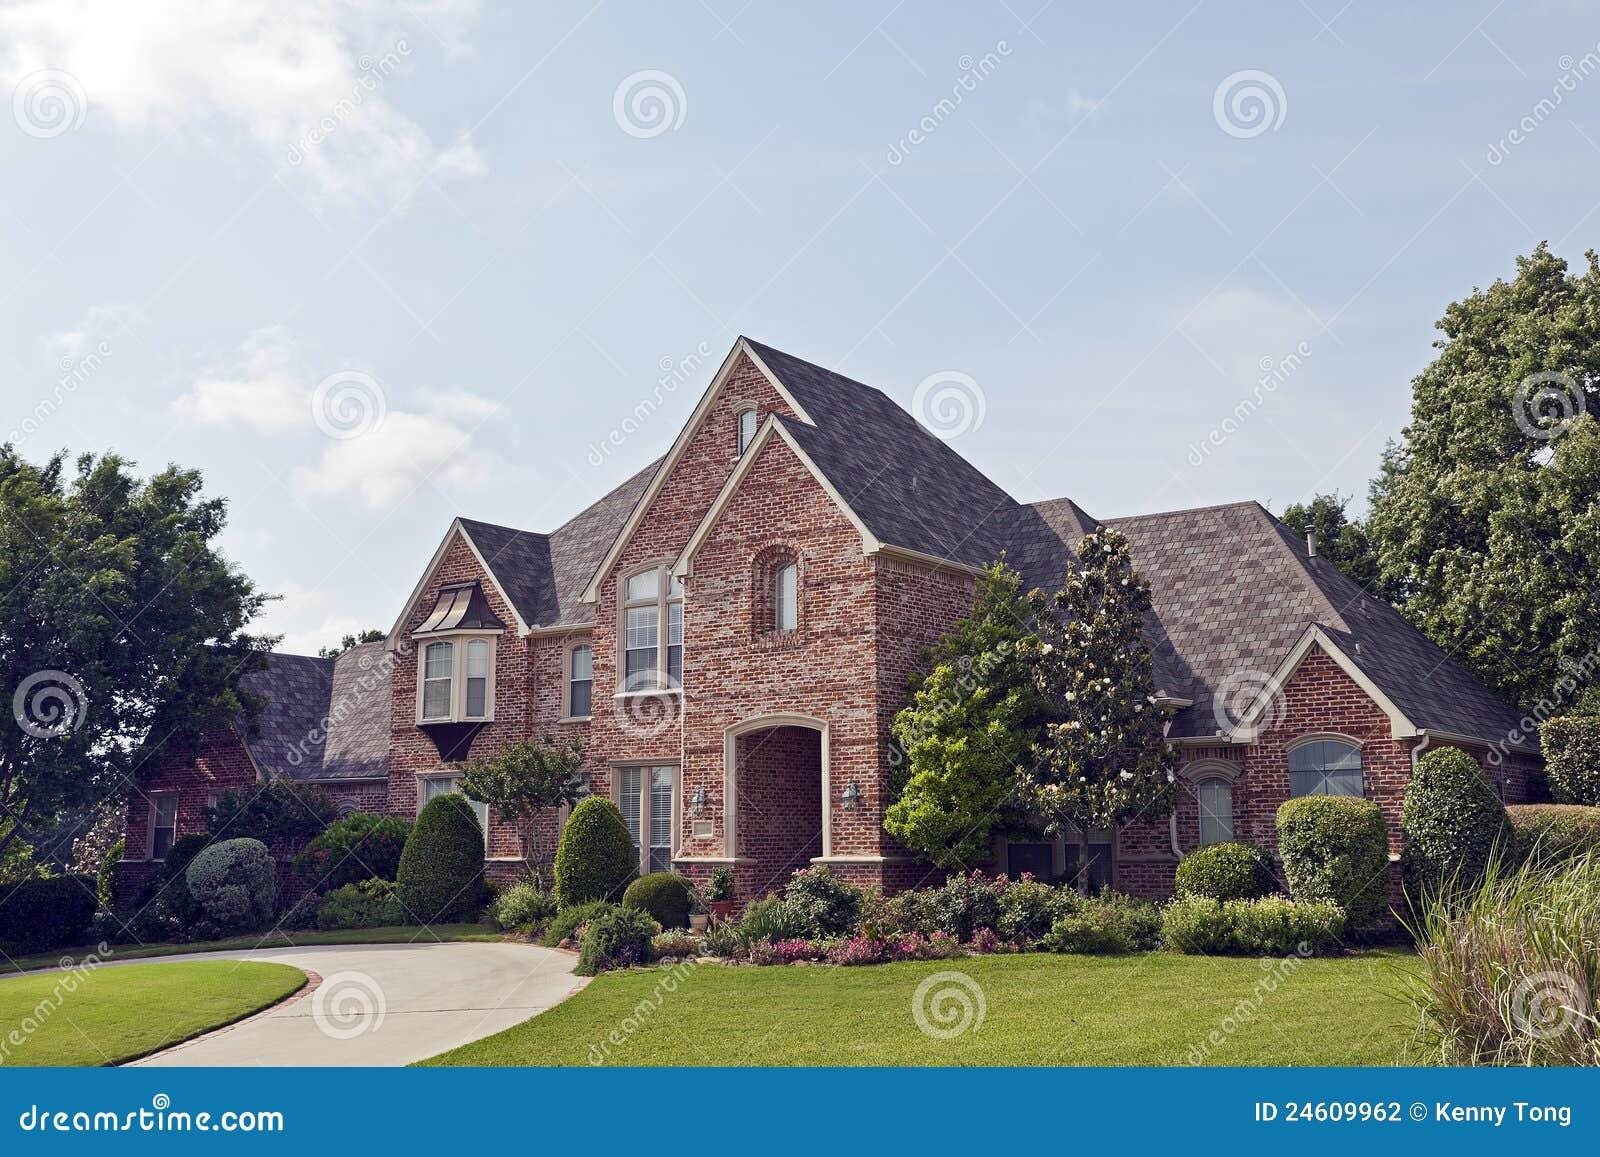 Luxury brick house stock photography image 24609962 for Luxury brick house plans